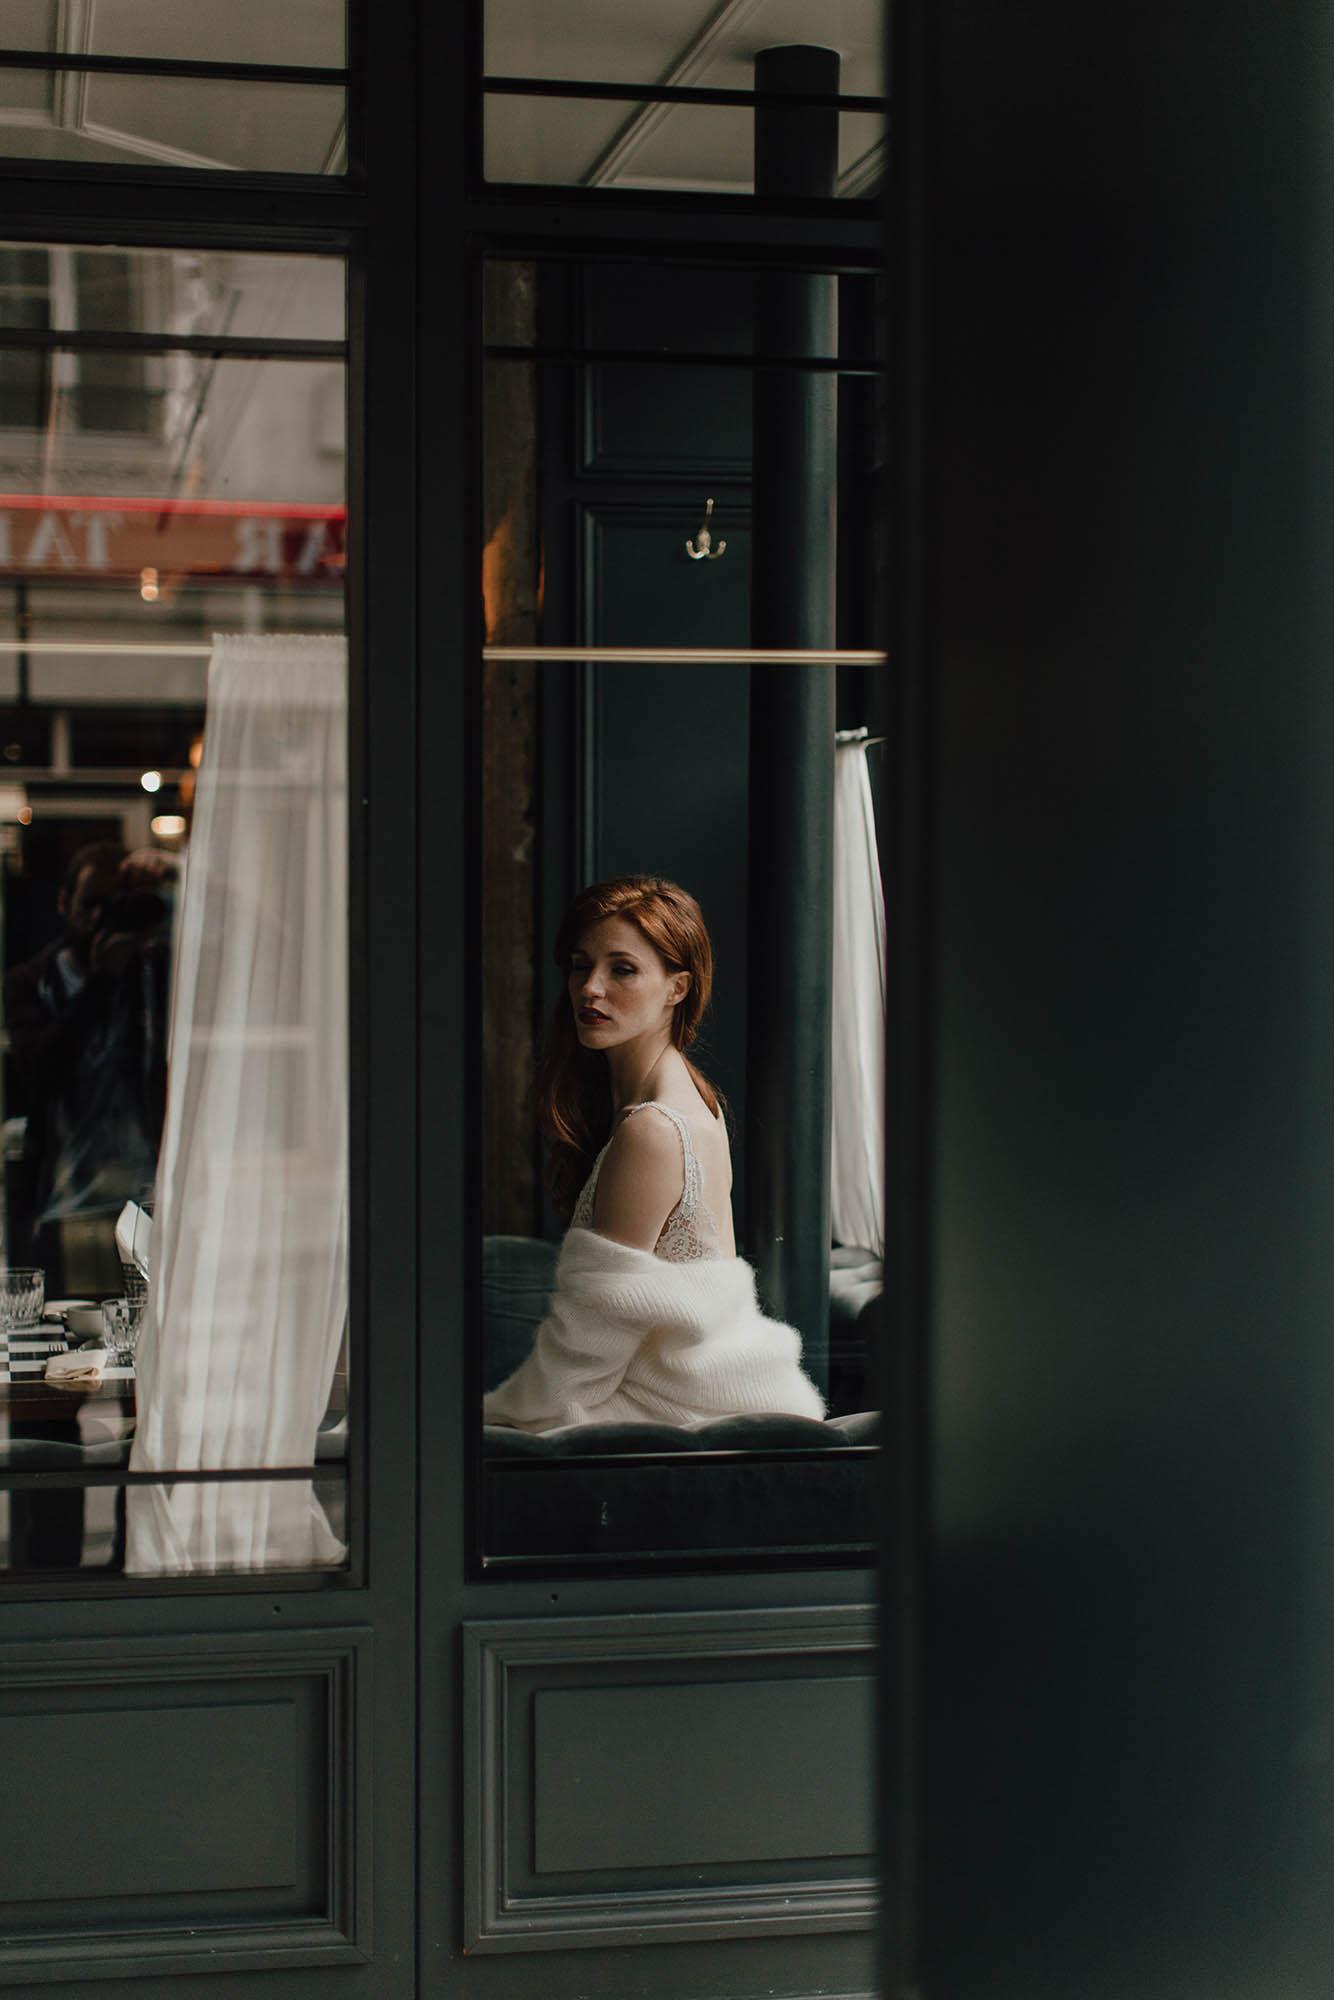 youmademydayphotography-destination-wedding-photographer-david-purves-boheme-rock-paris-web-79